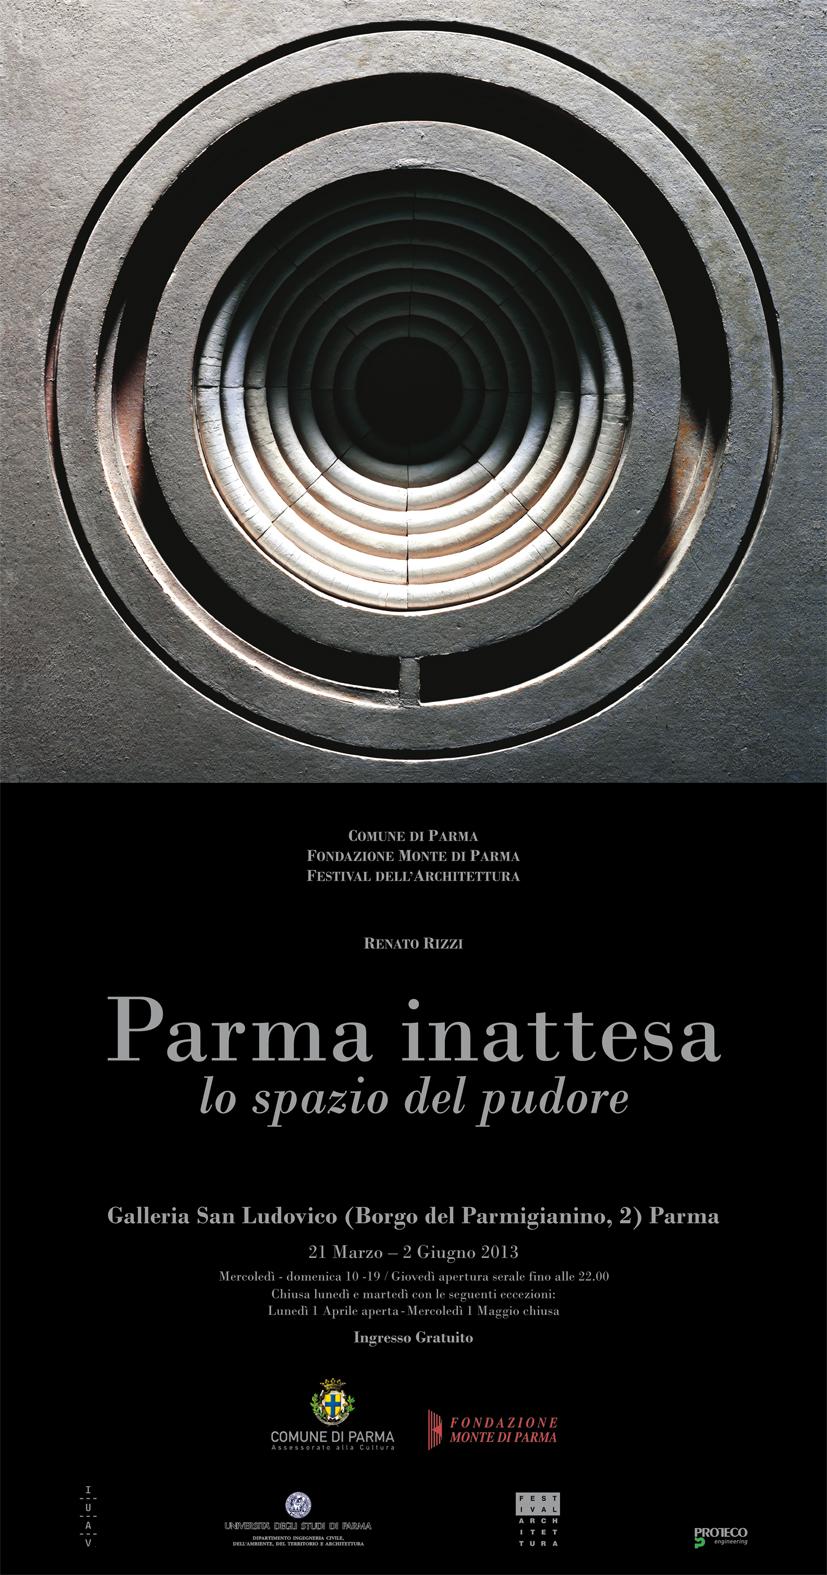 Parma inattesa